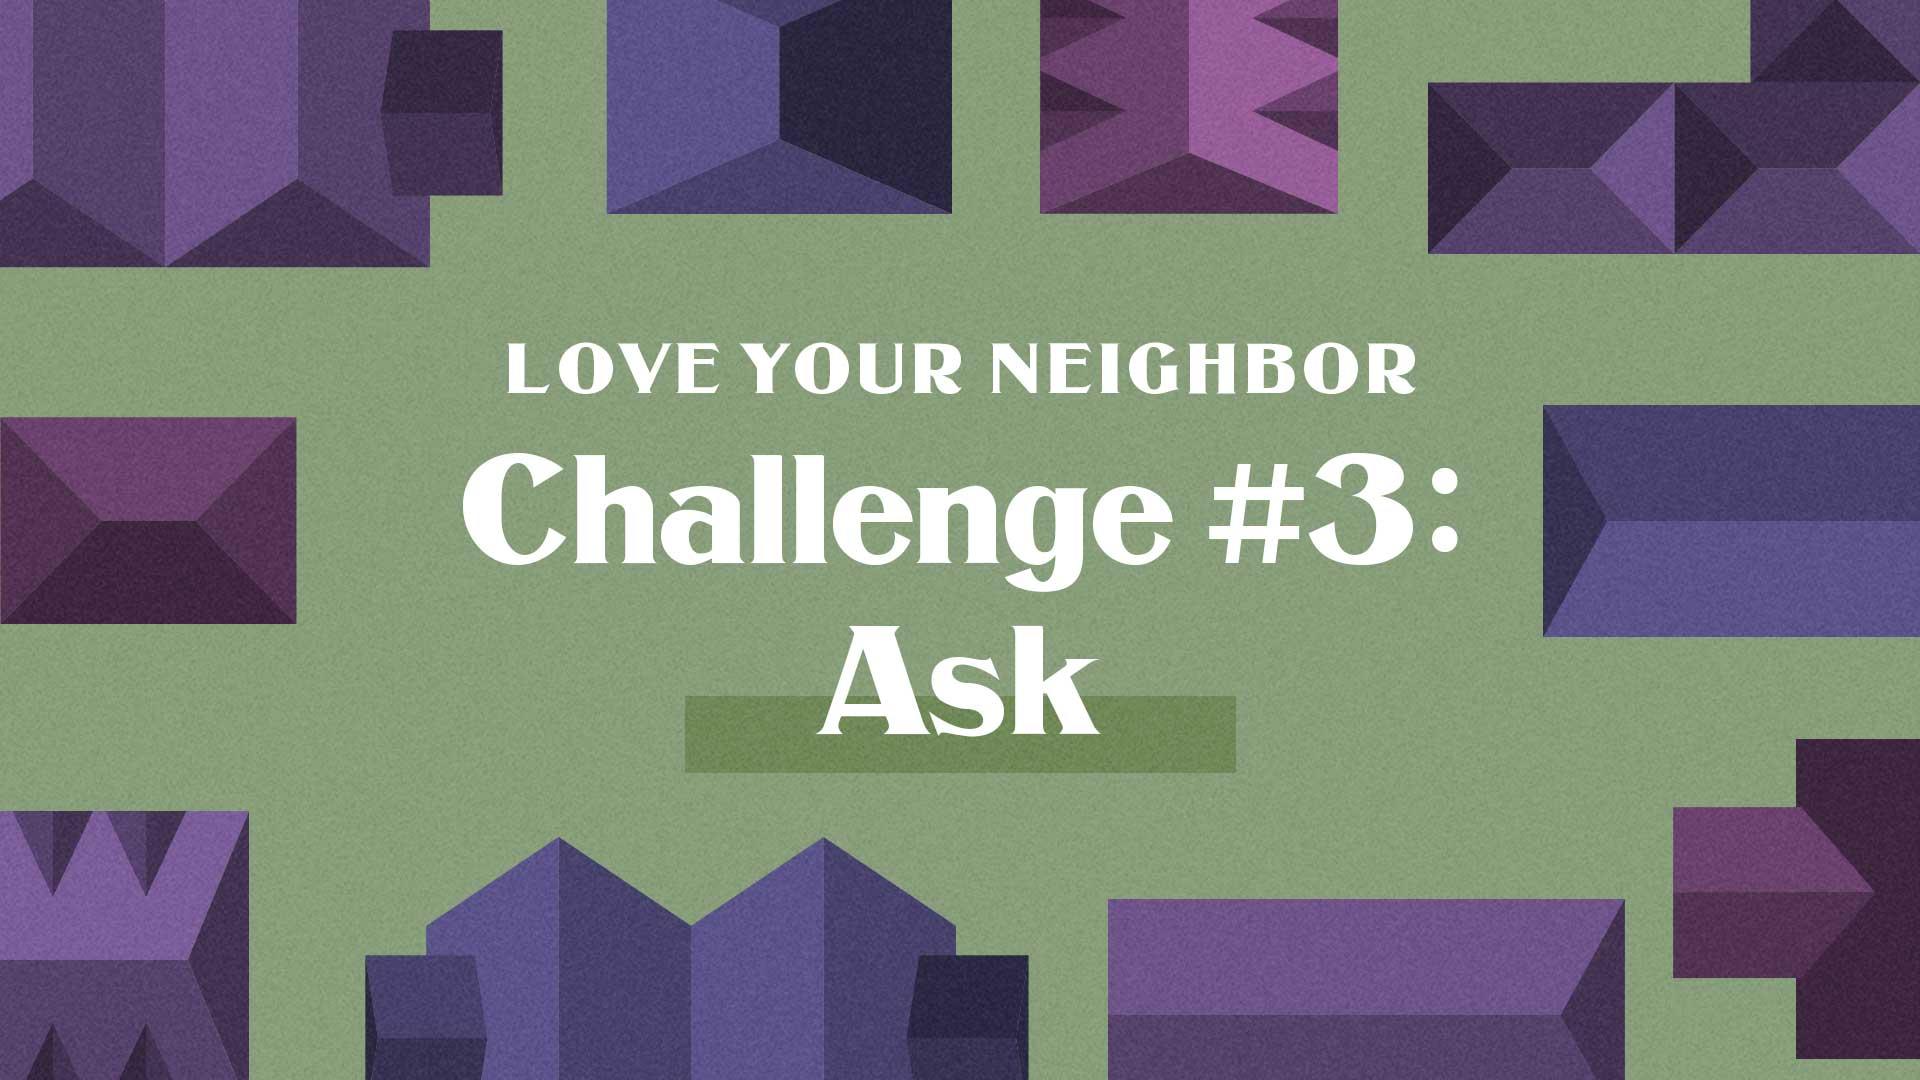 Love Your Neighbor Challenge #3: Ask